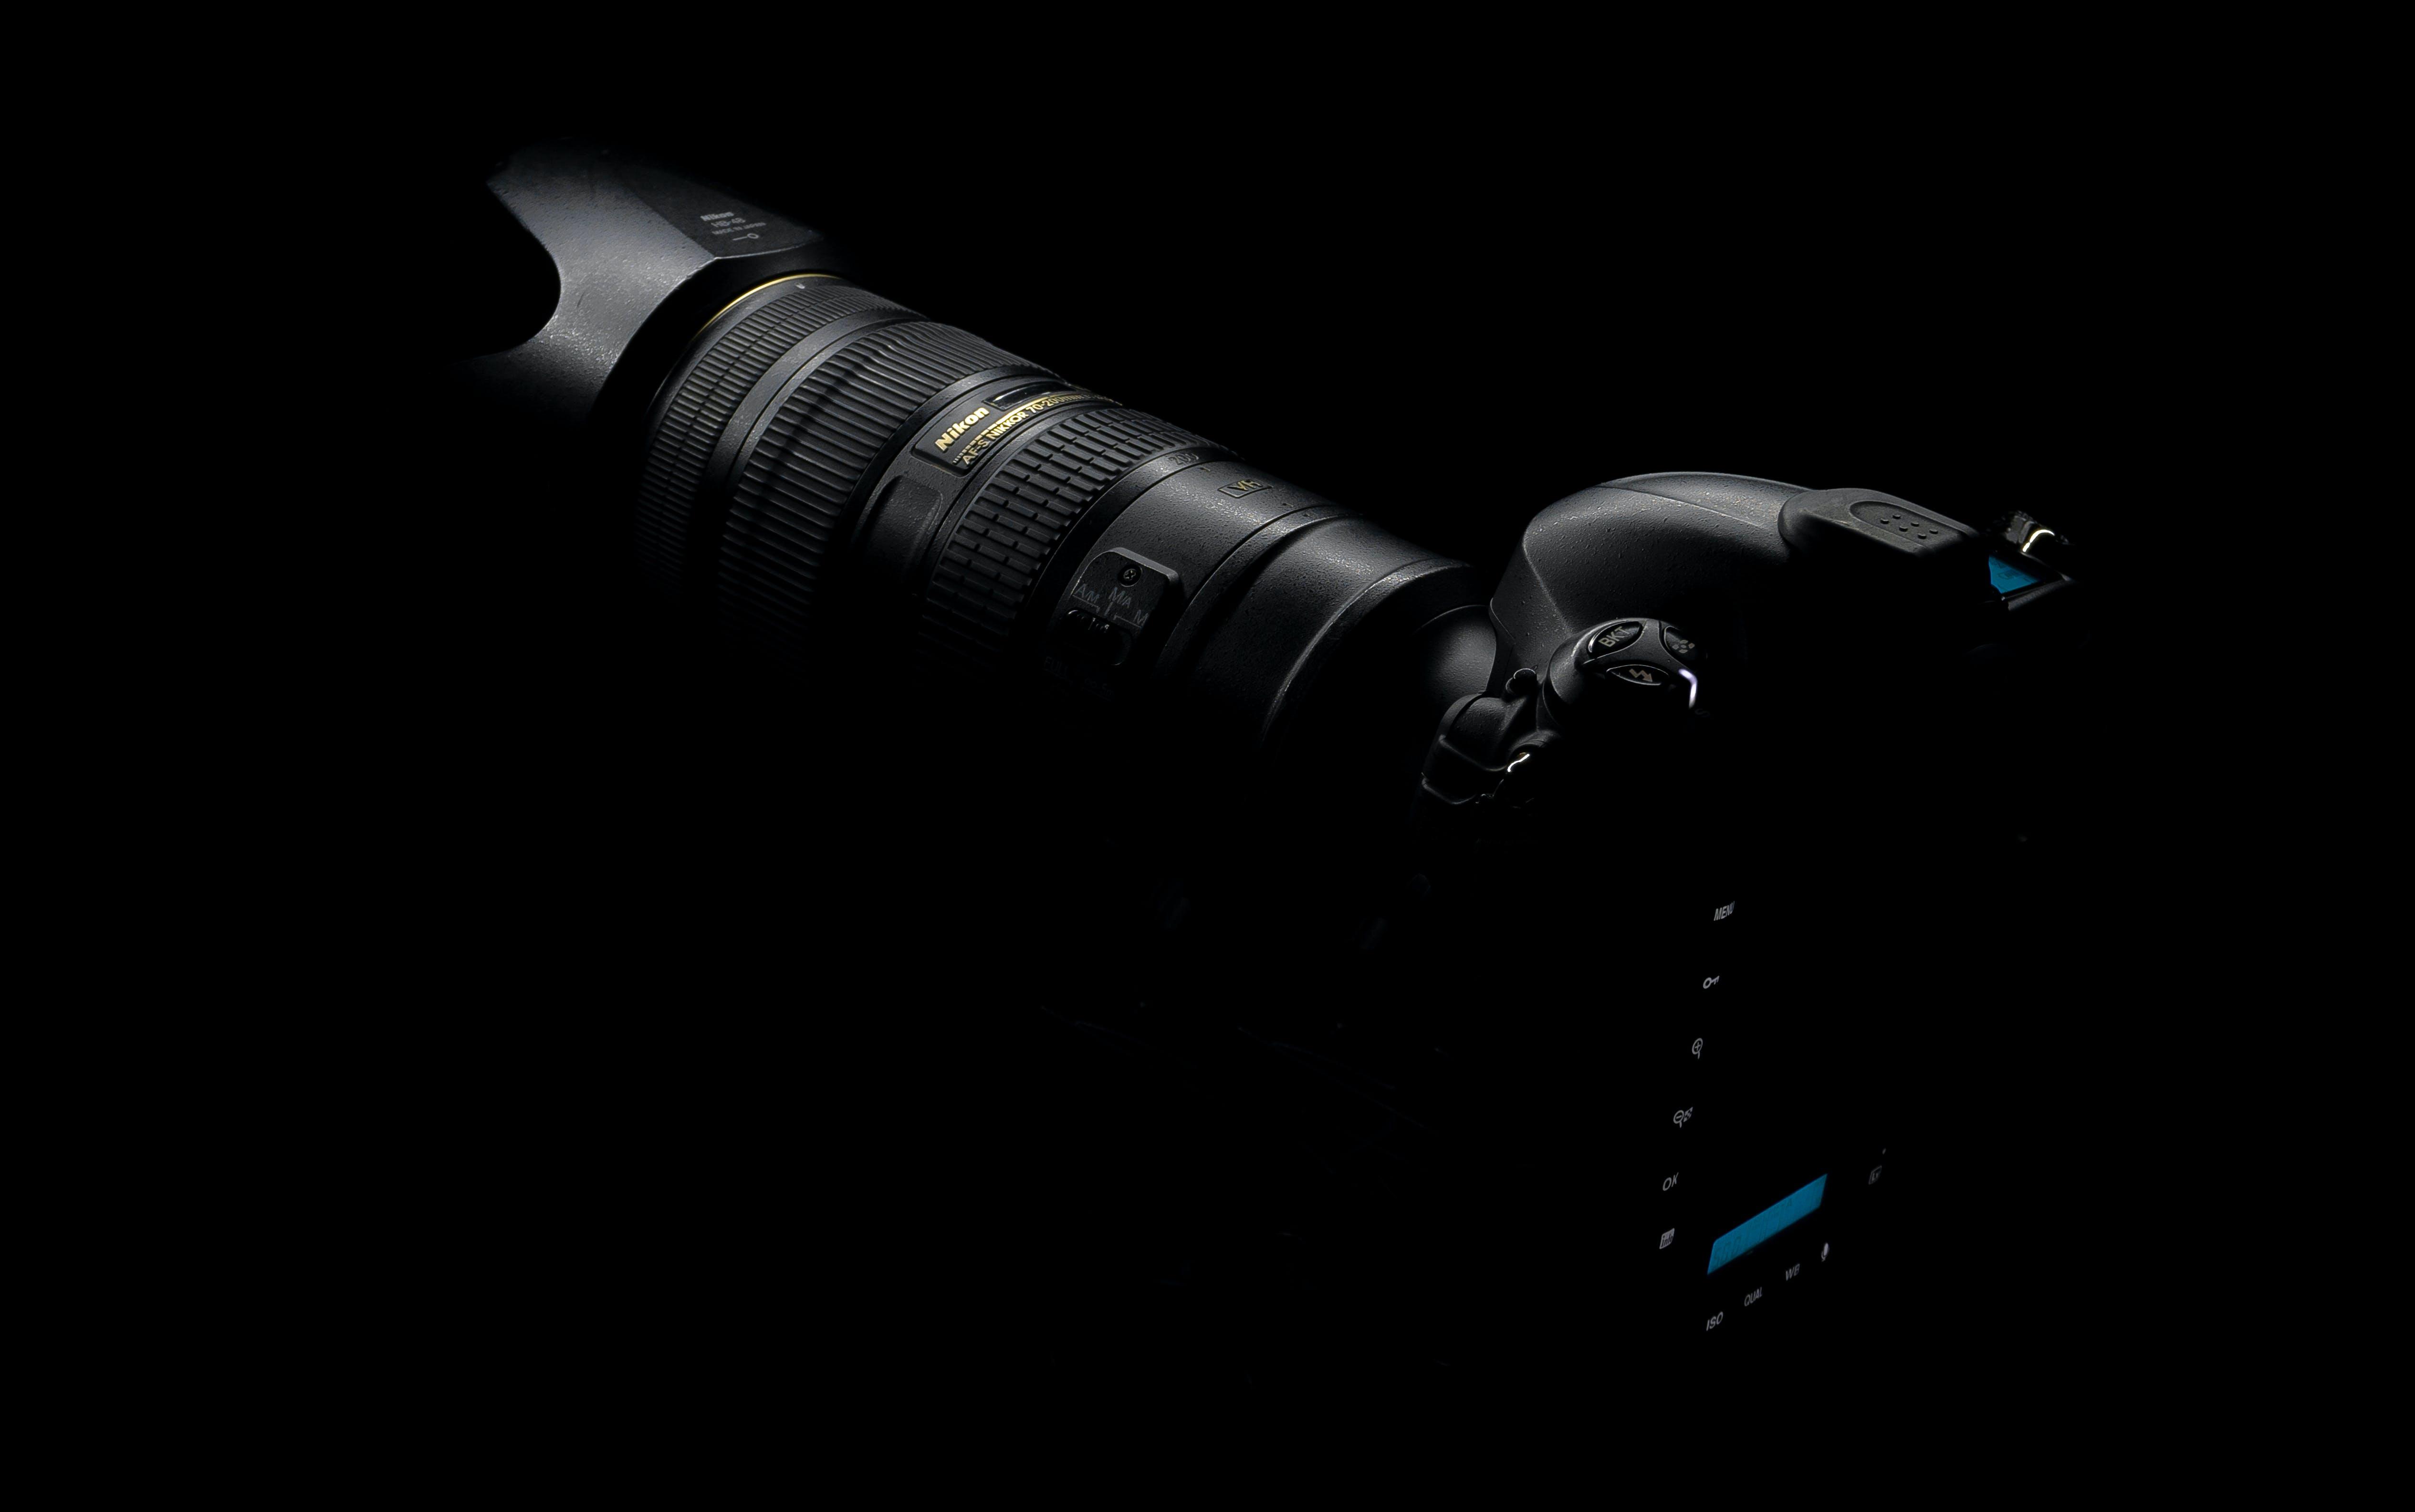 Free stock photo of 70-200, black and white, camera, camera equipment